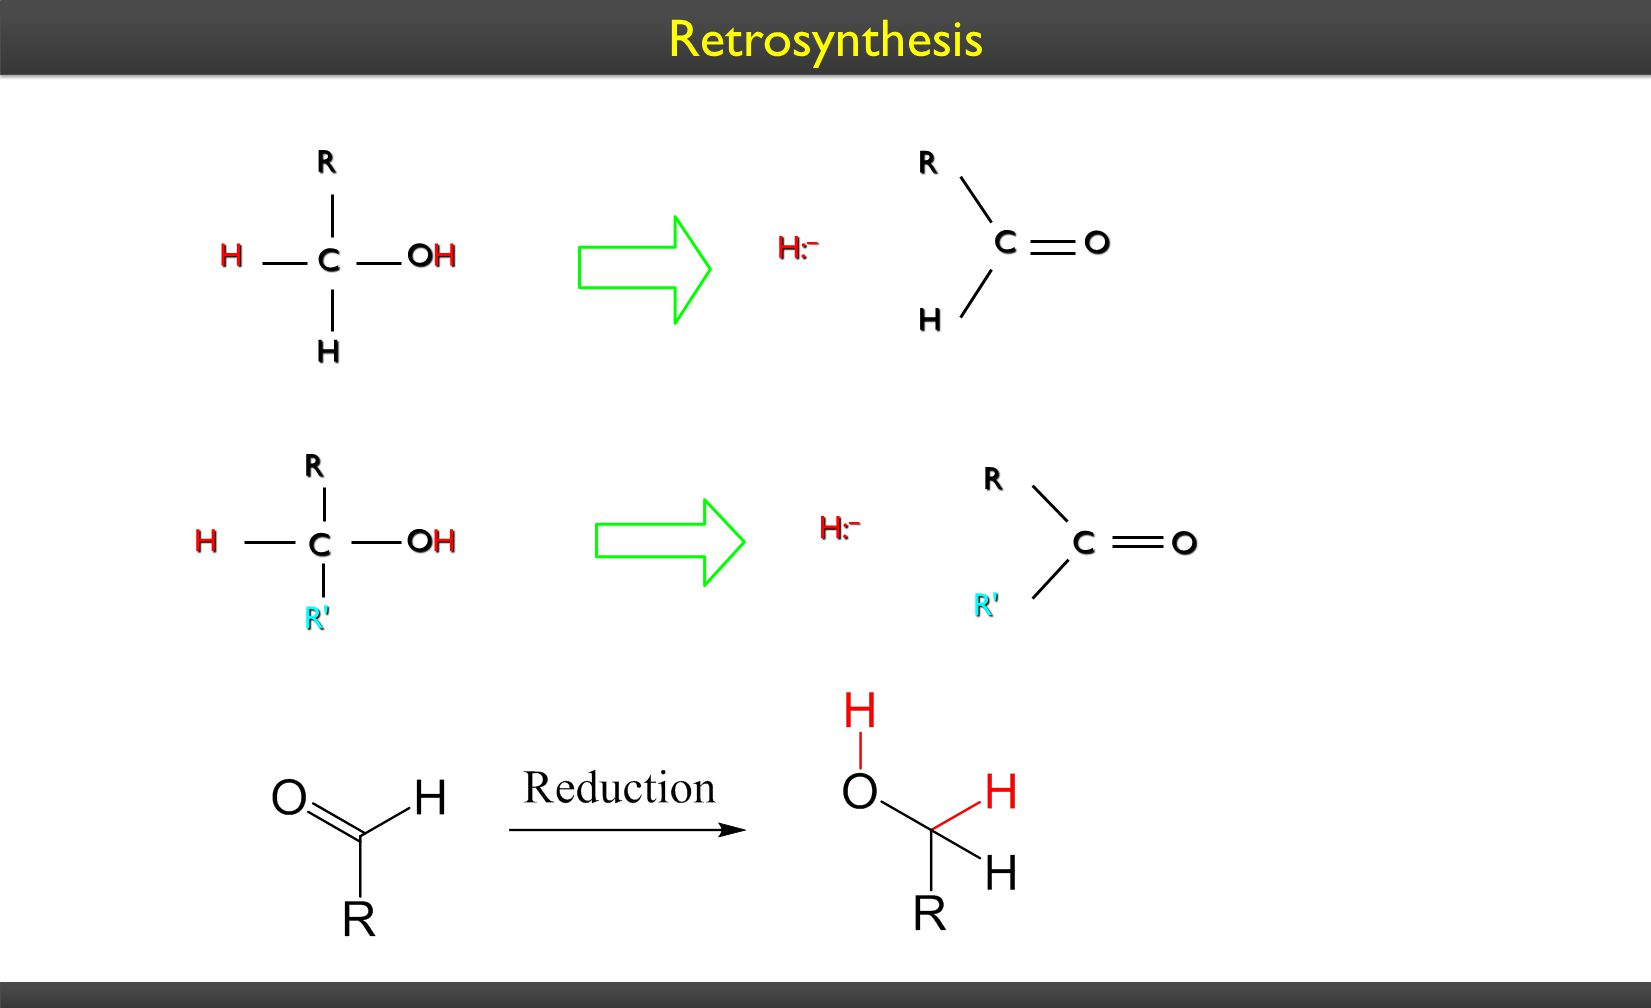 Retrosynthesis H: – CRH OHOHOHOH H C R H O CRH OHOHOHOH R C R R O